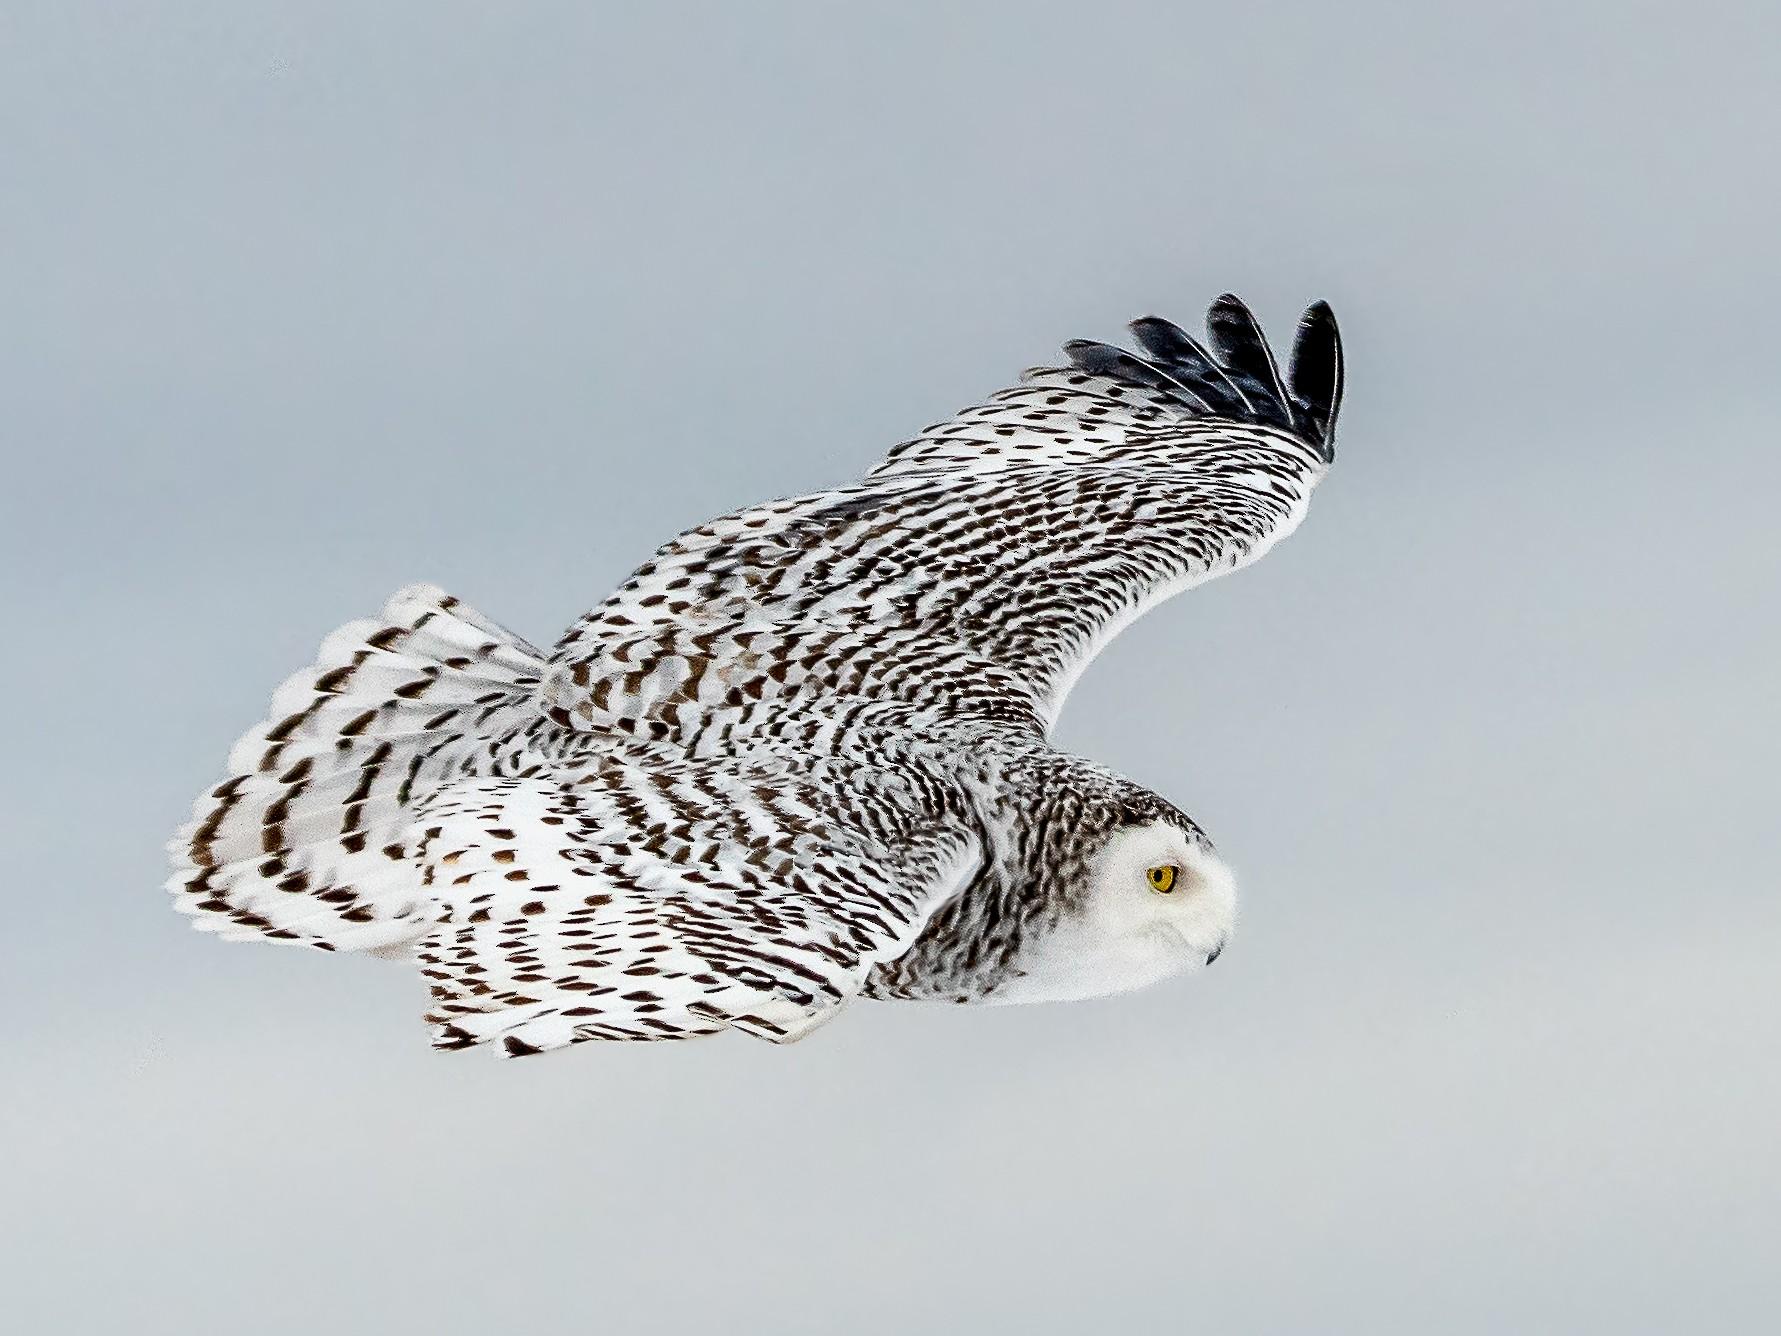 Snowy Owl - Ed Lee